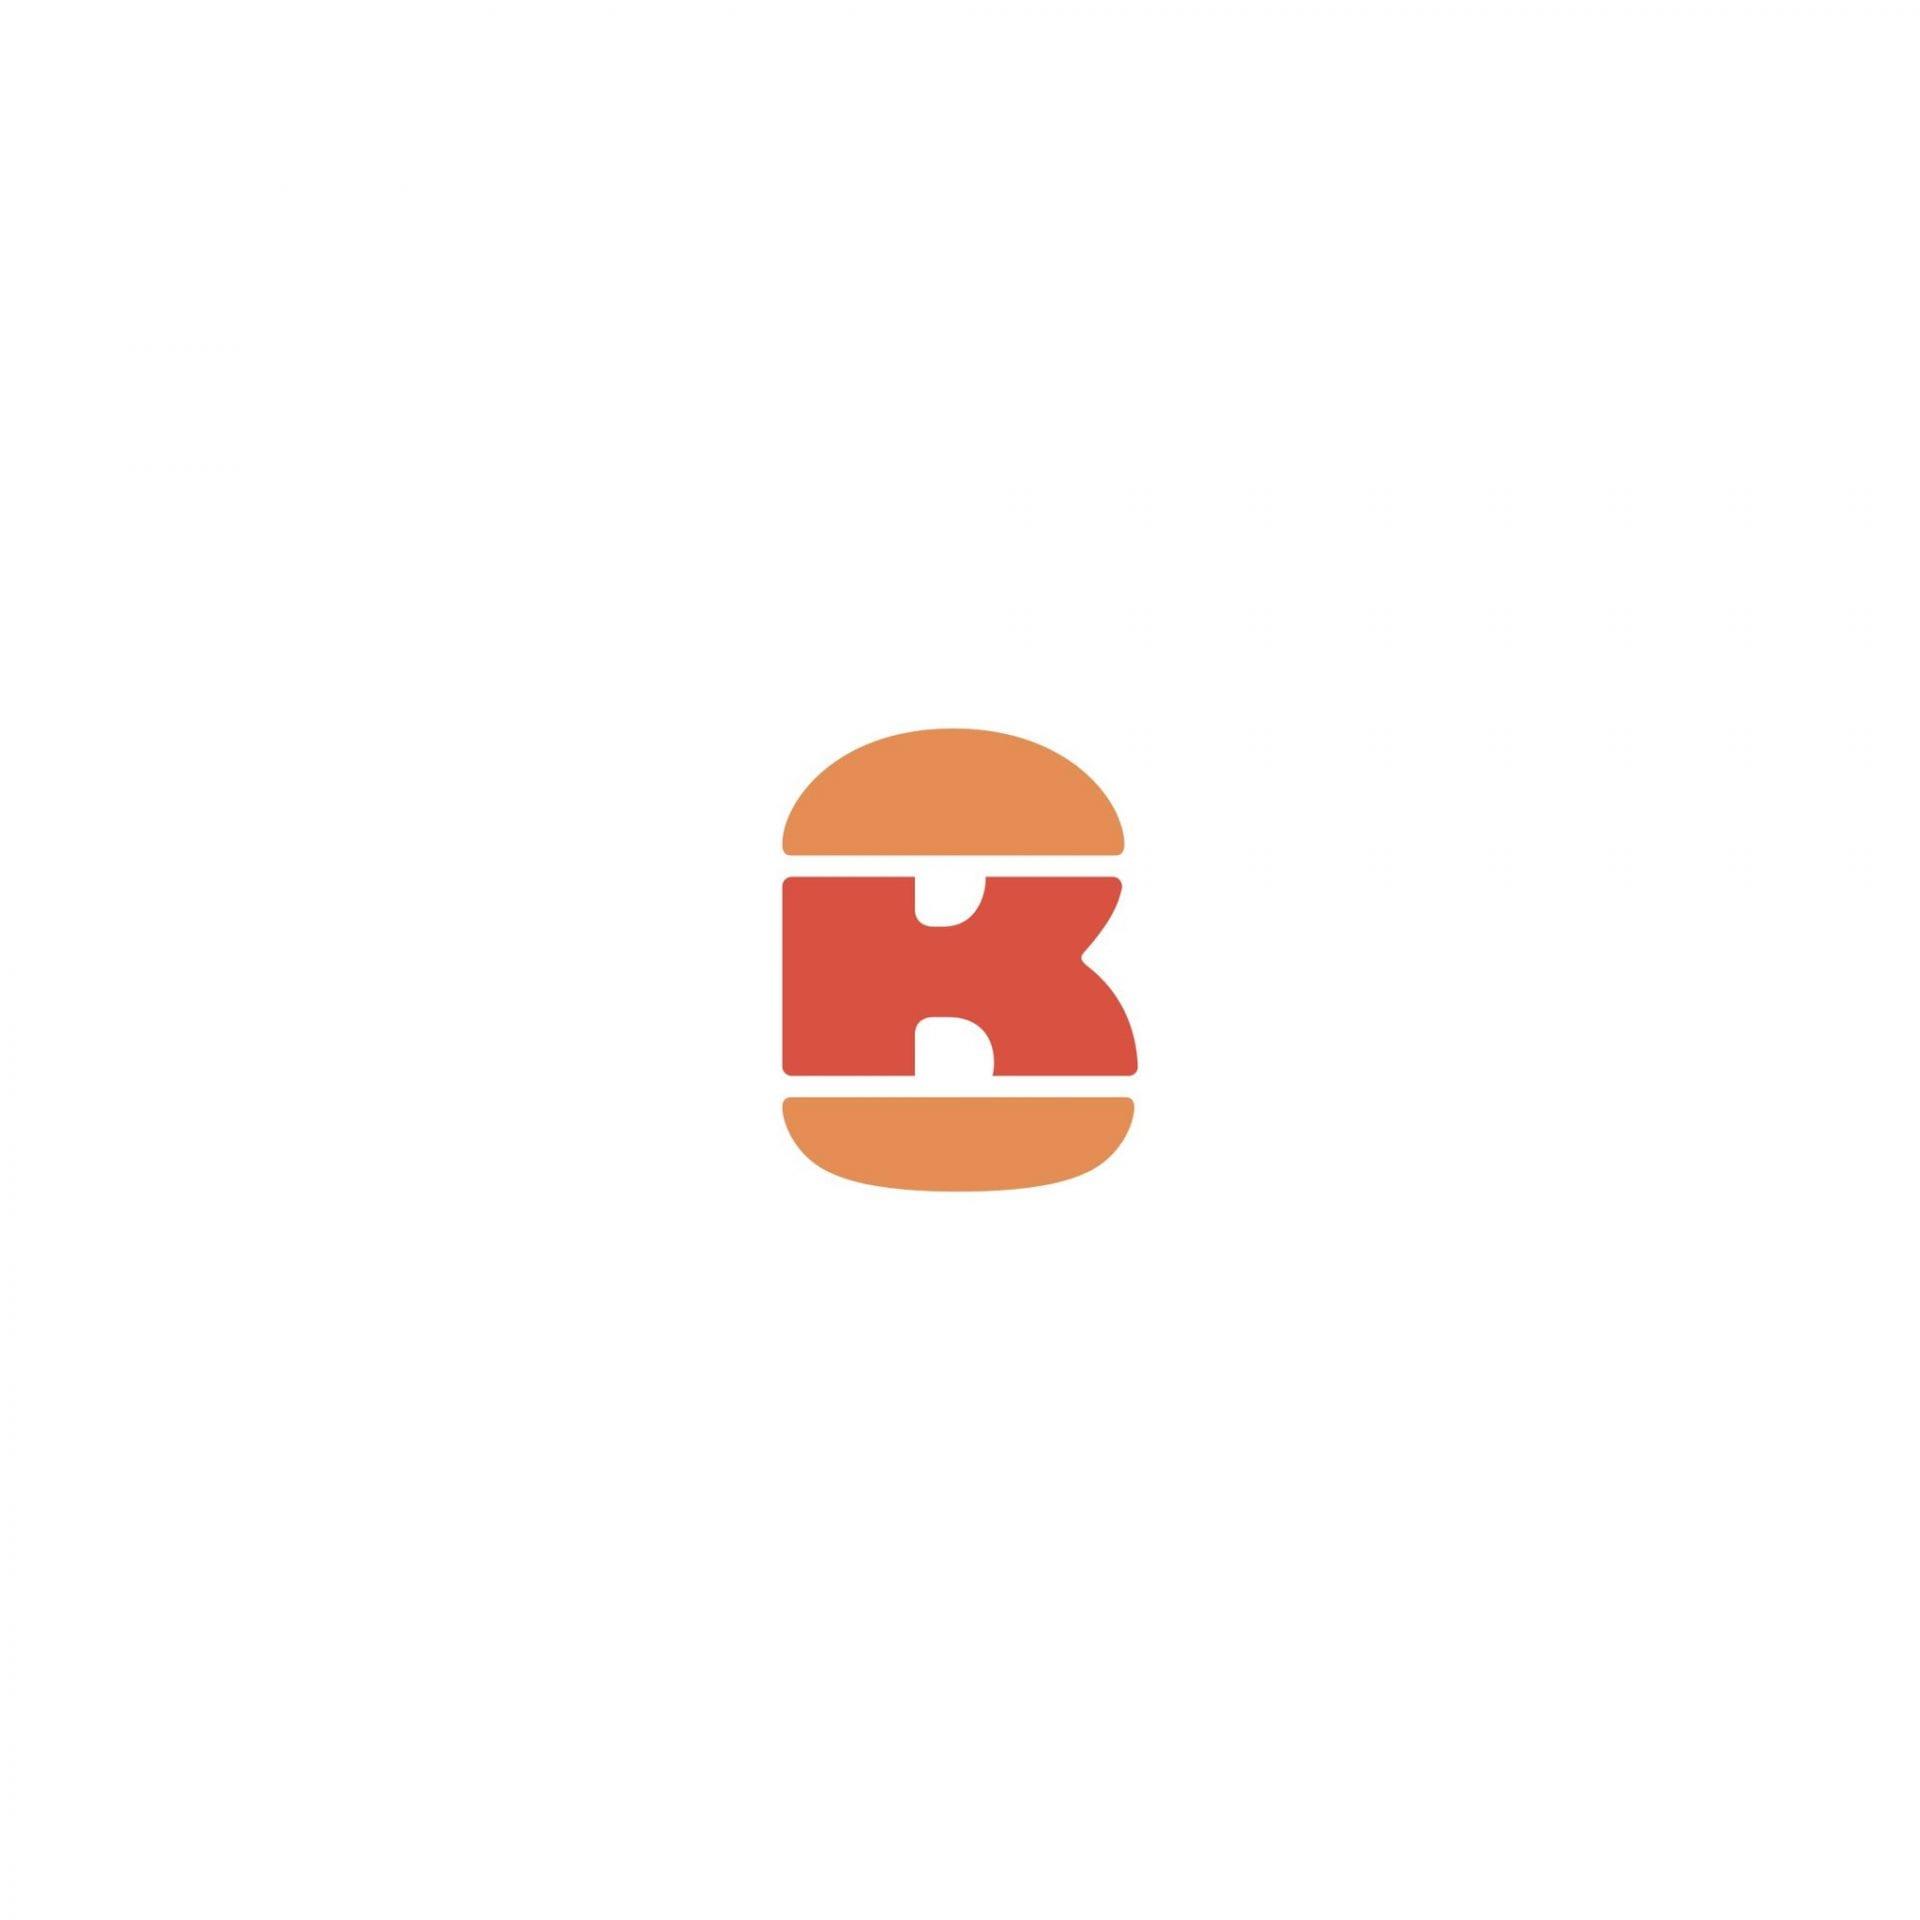 Le logo minimaliste de Burger King